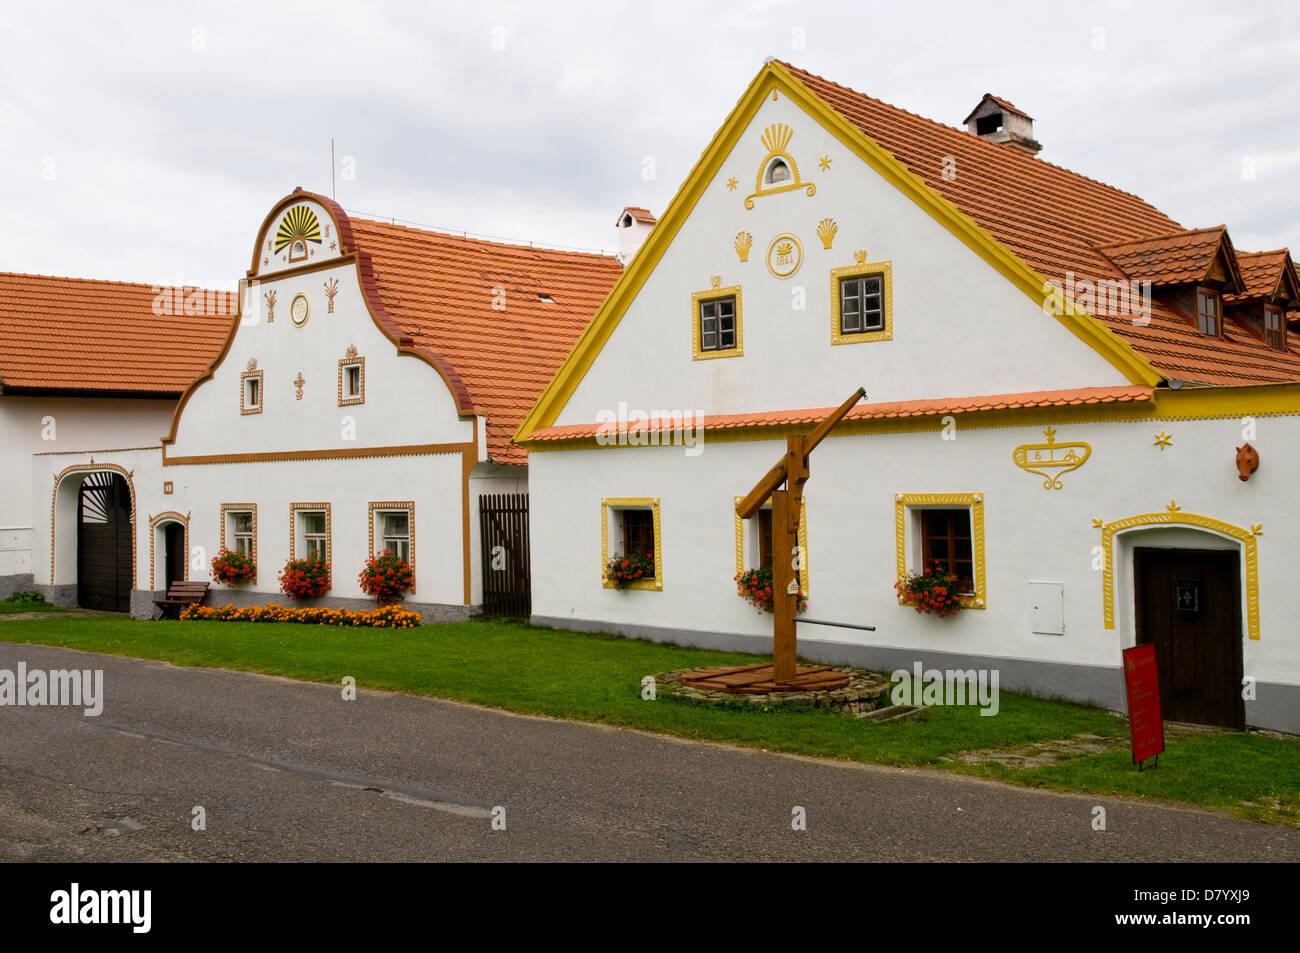 Baroque Houses in Holasovice, Bohemia, Czech Republic - Stock Image